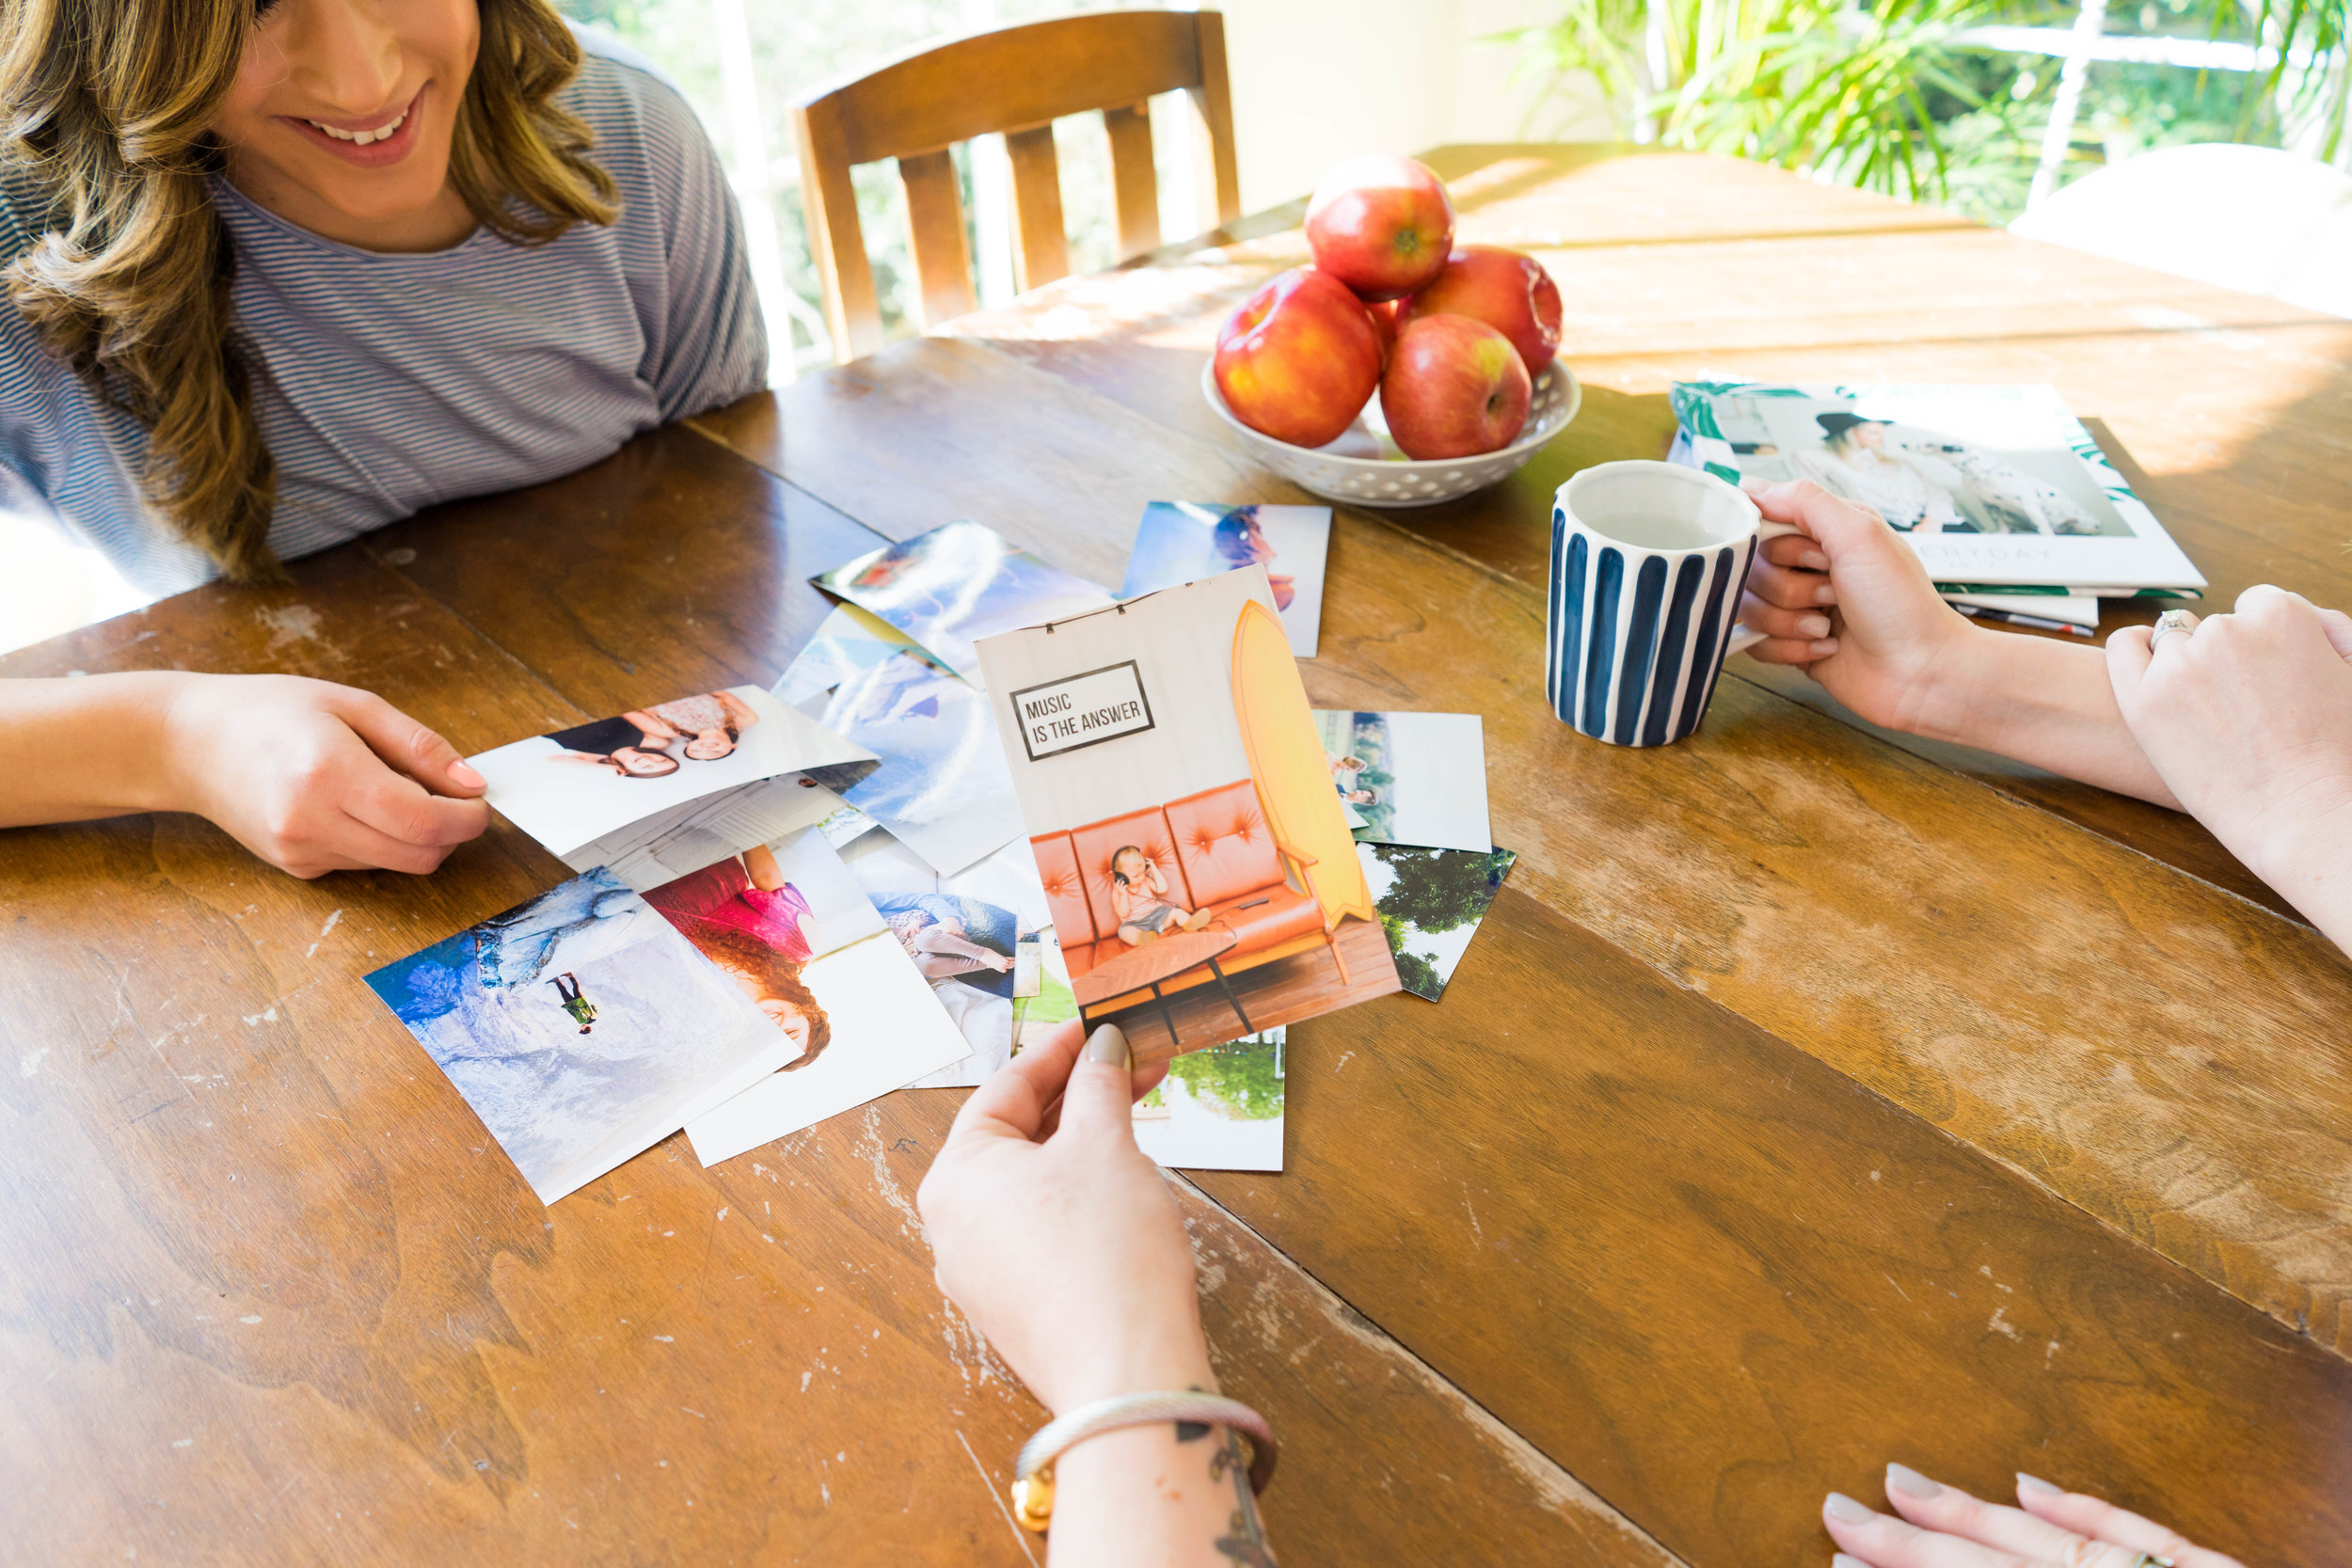 Marie-Kondo-KonMari-Photo-Organization-3.jpg